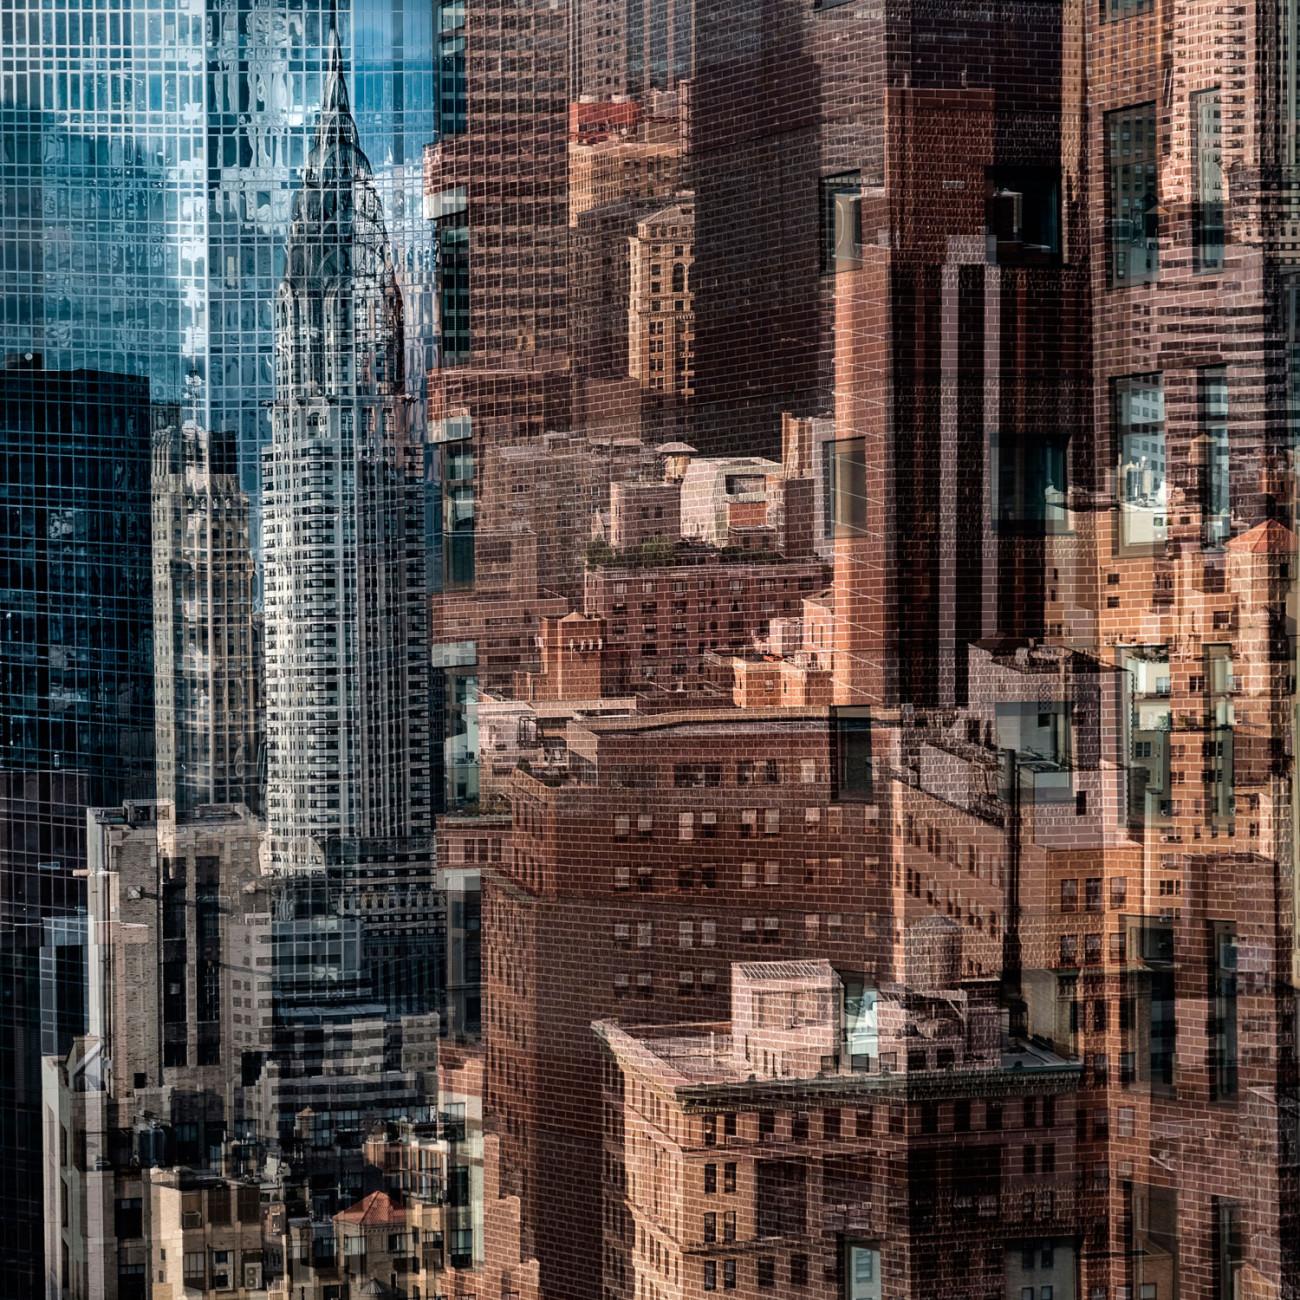 Metropolis - Brick by brick, NY, 2015